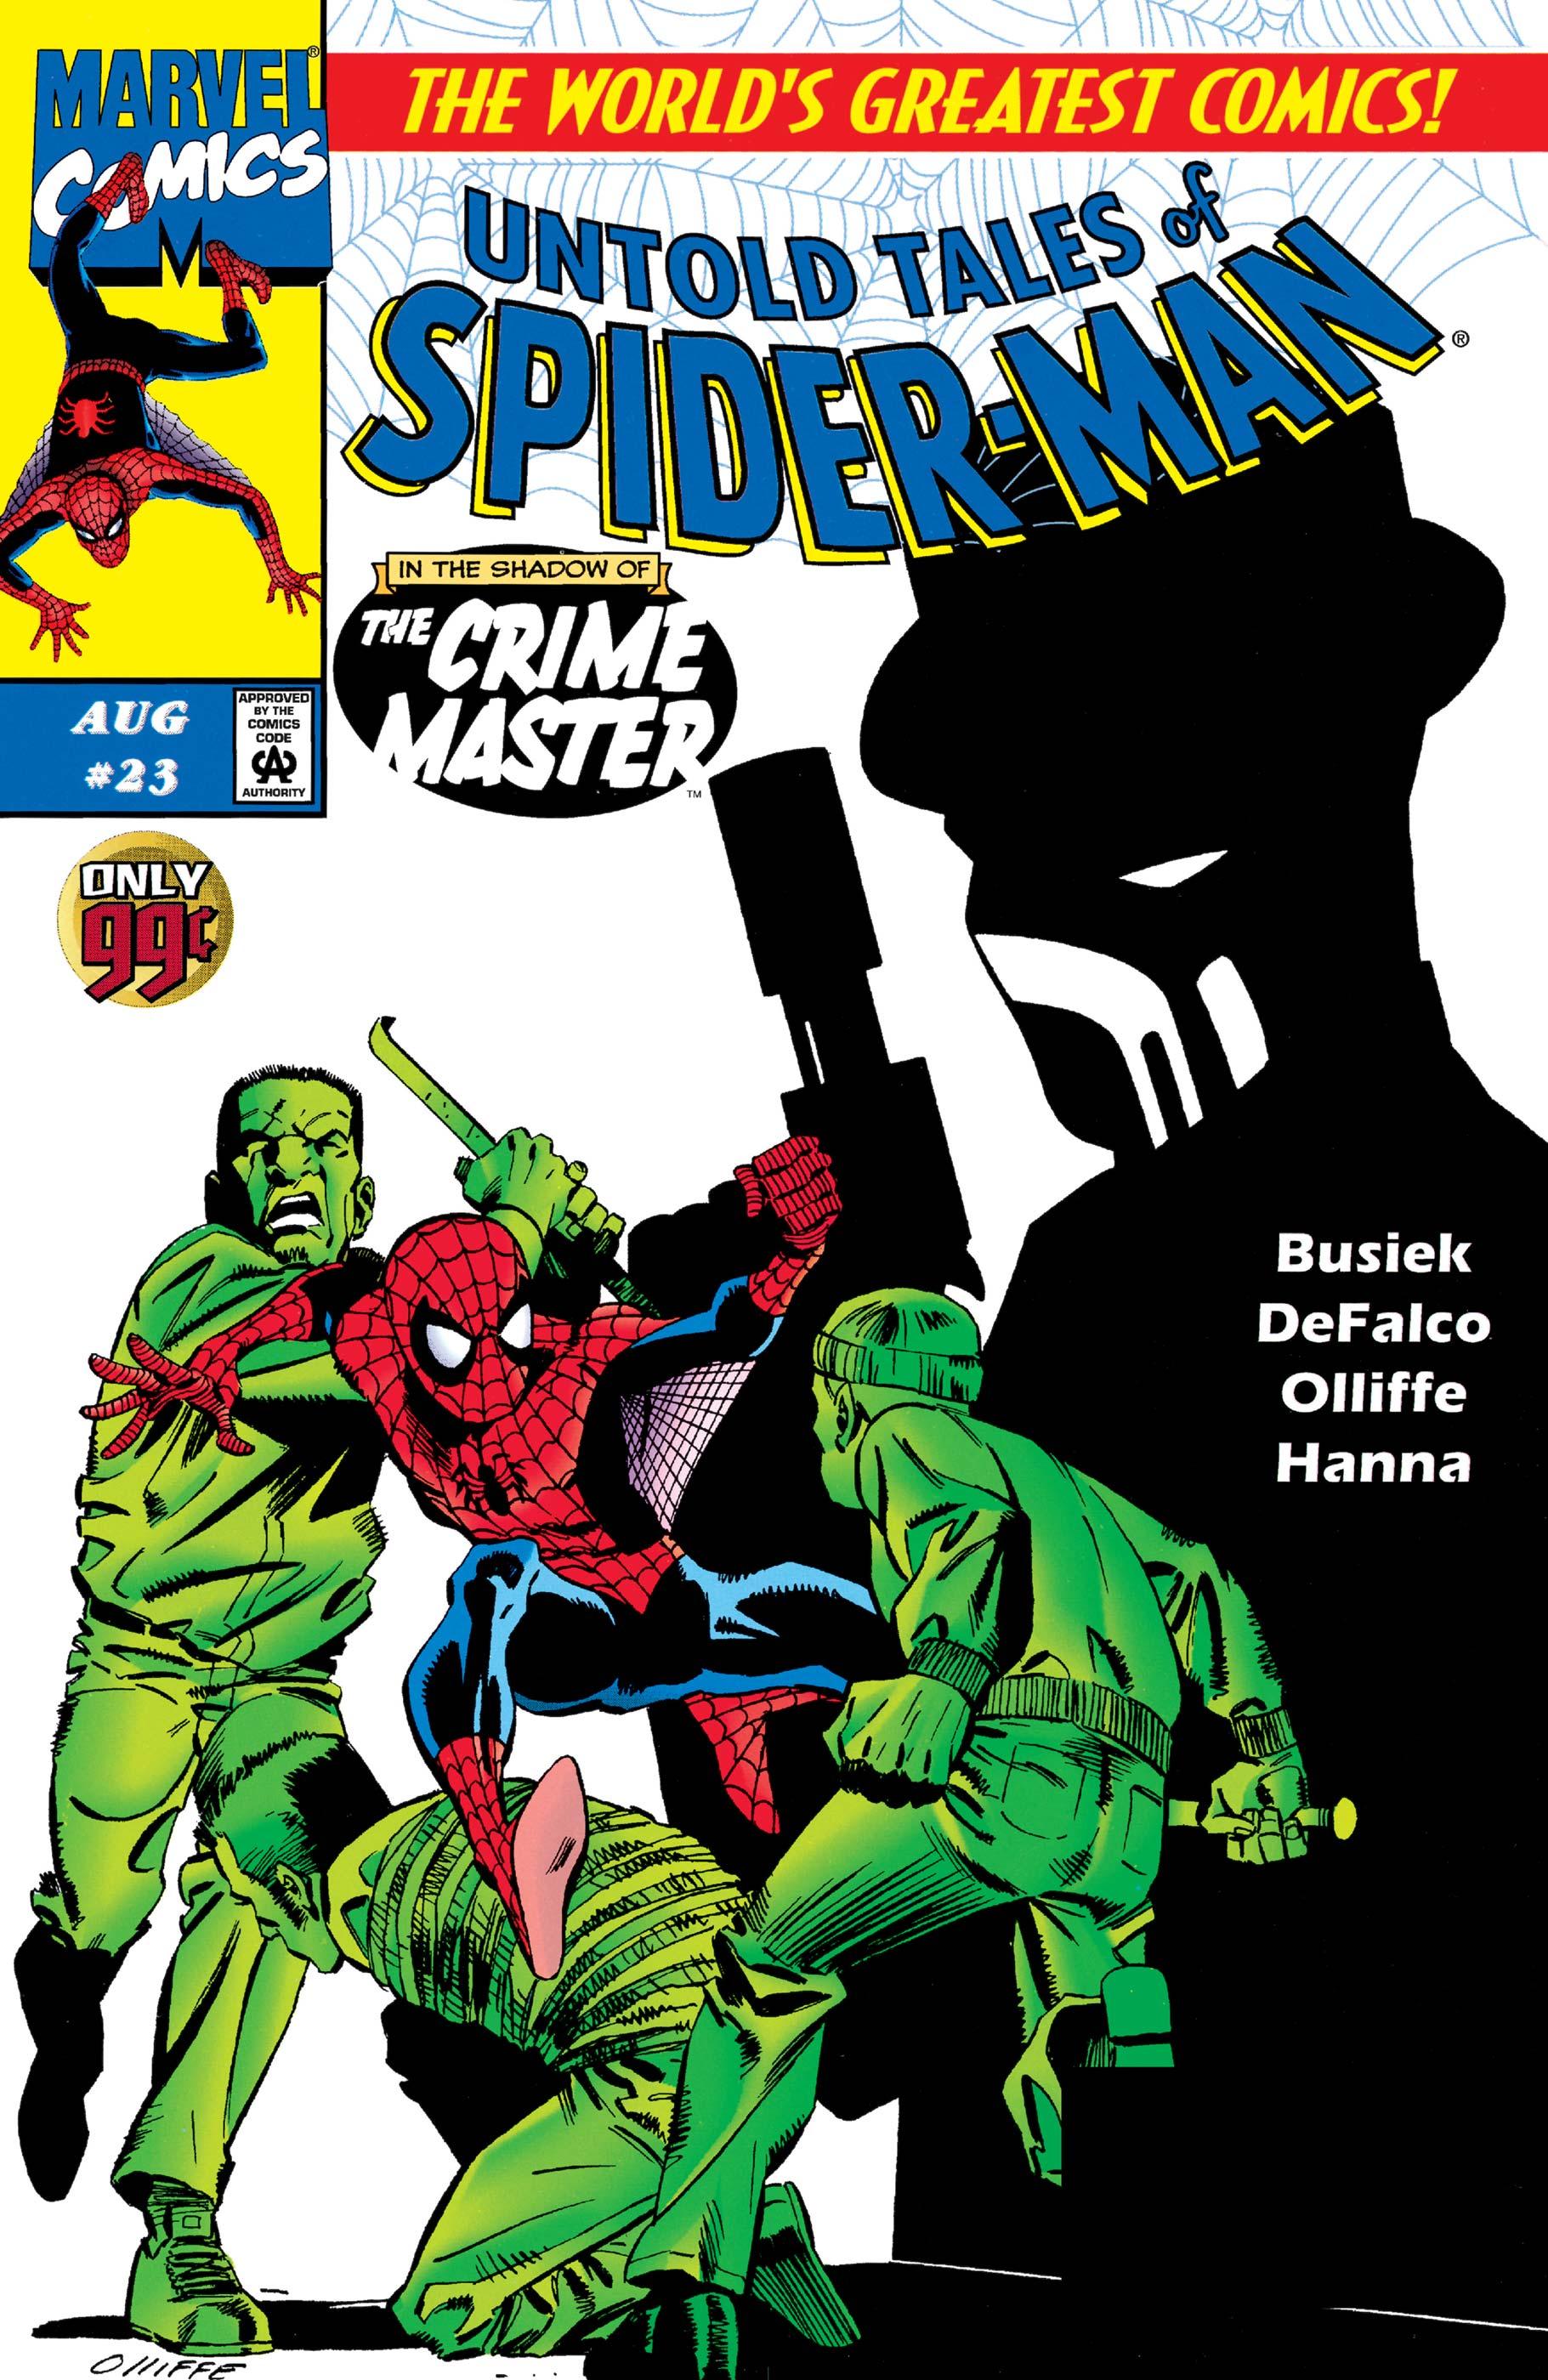 Untold Tales of Spider-Man (1995) #23